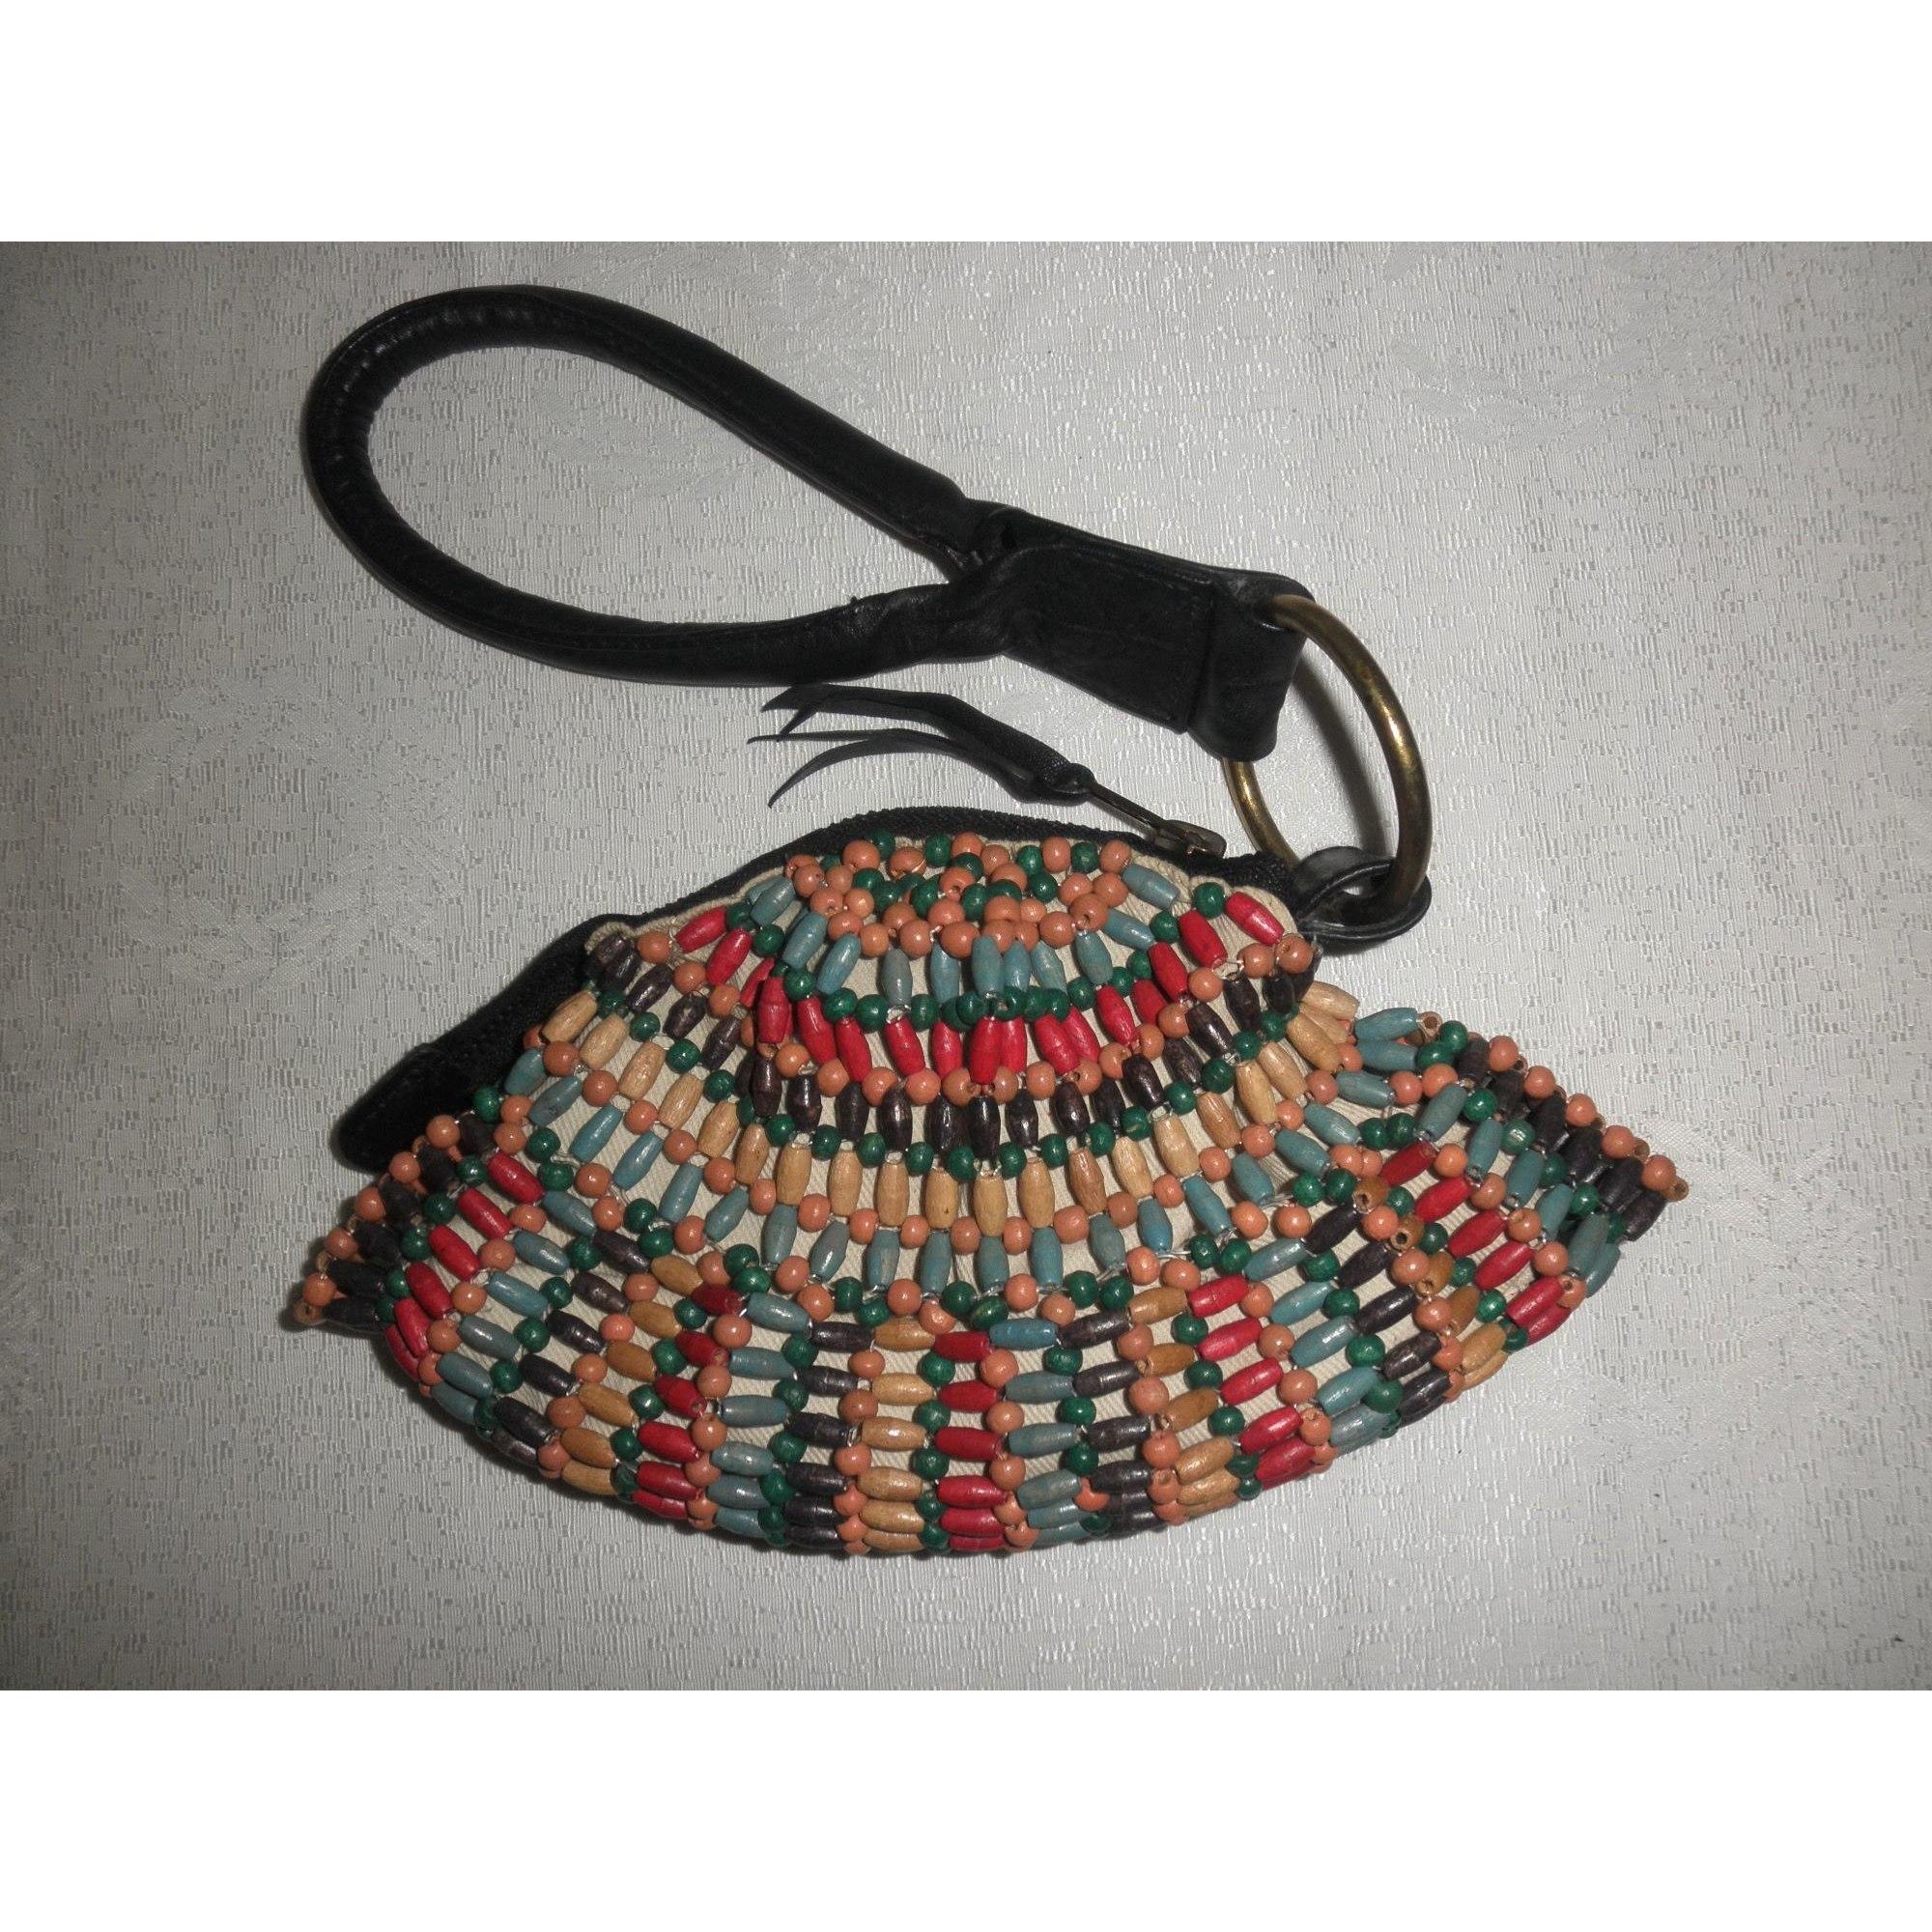 Pochette CACHAREL cuir & perles de bois multicolore